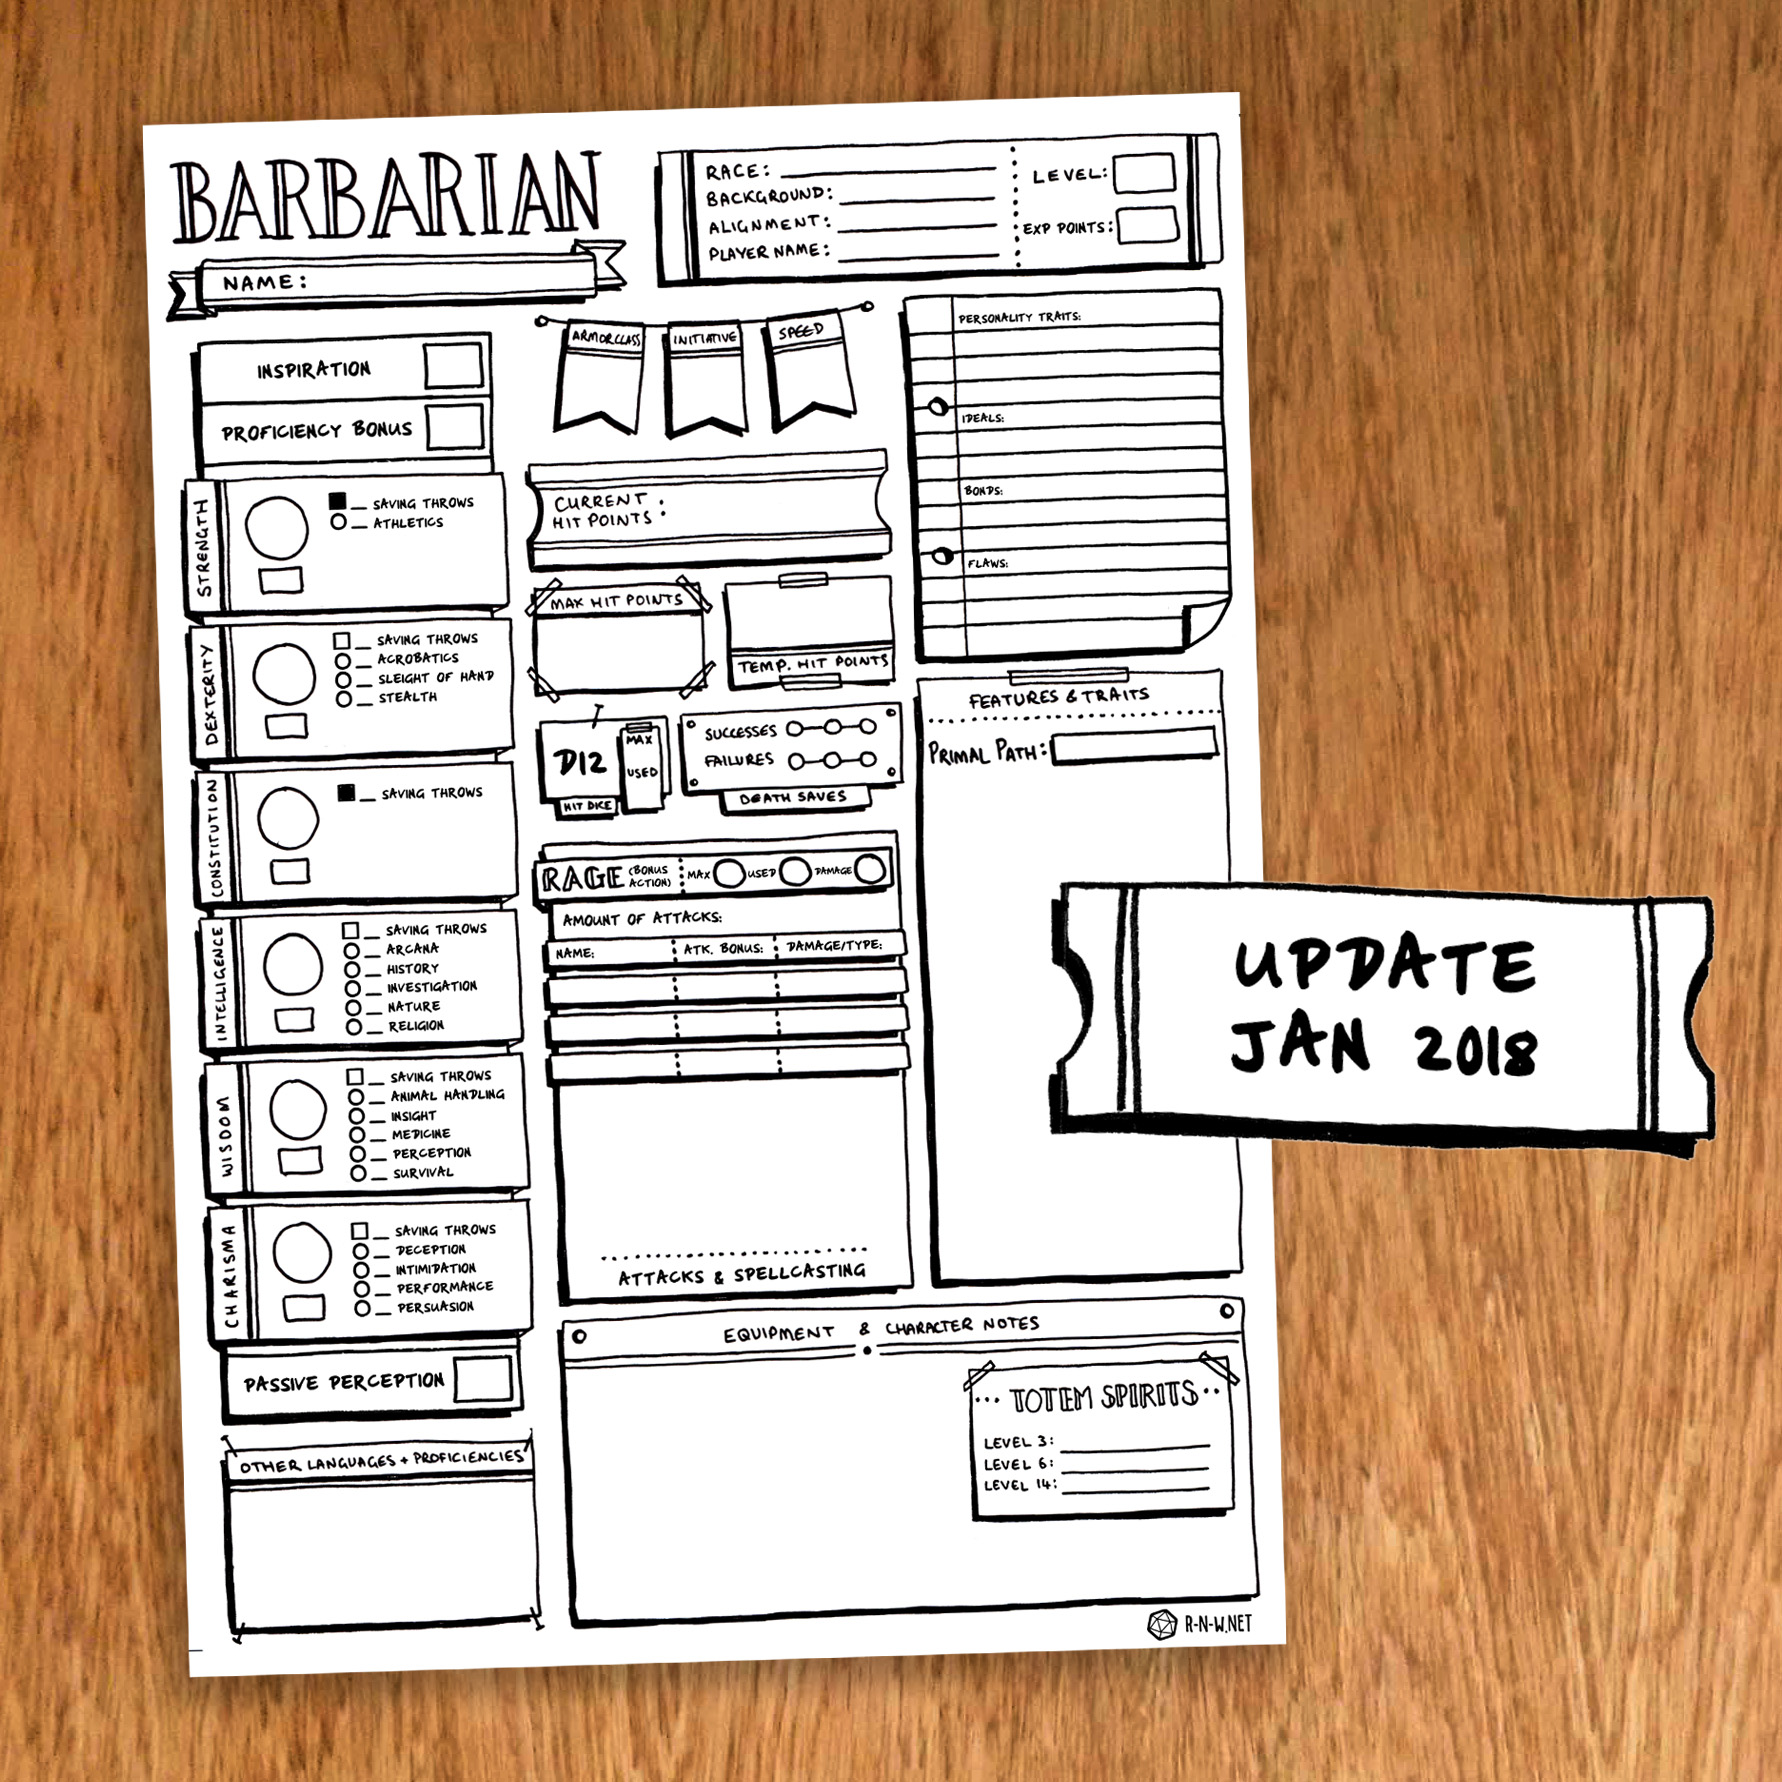 barbarian character sheet barbarian - individual character sheet pack - classic style — r-n-w